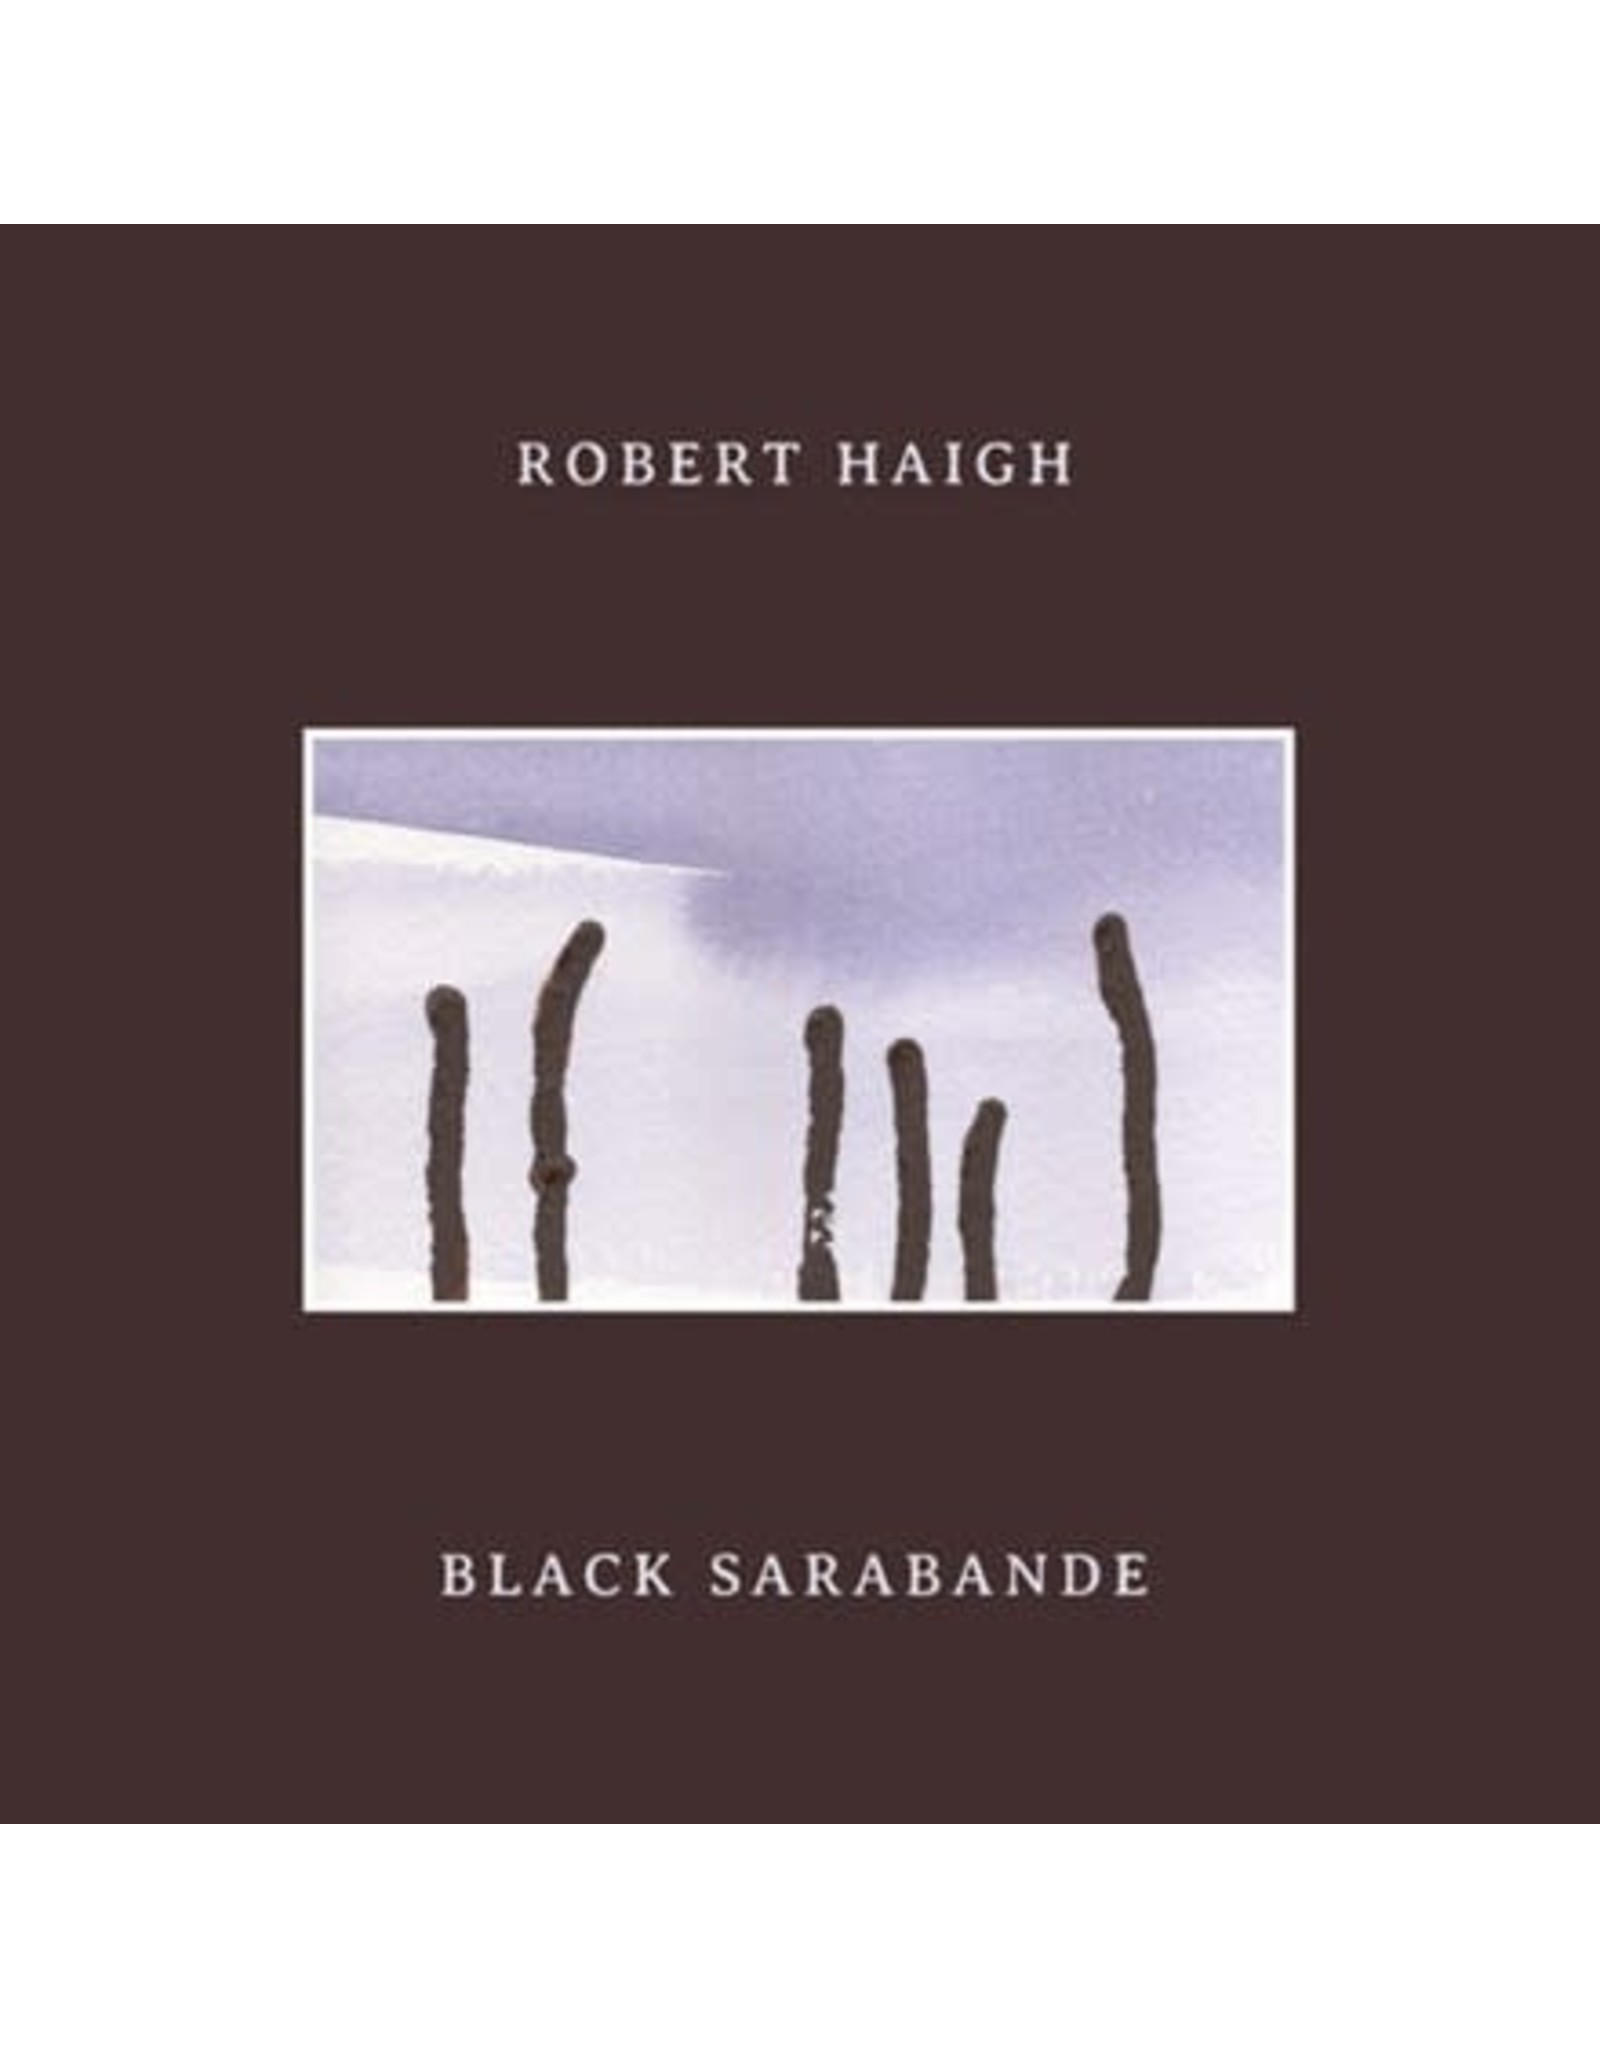 Unseen Worlds Haigh, Robert: Black Sarabande LP